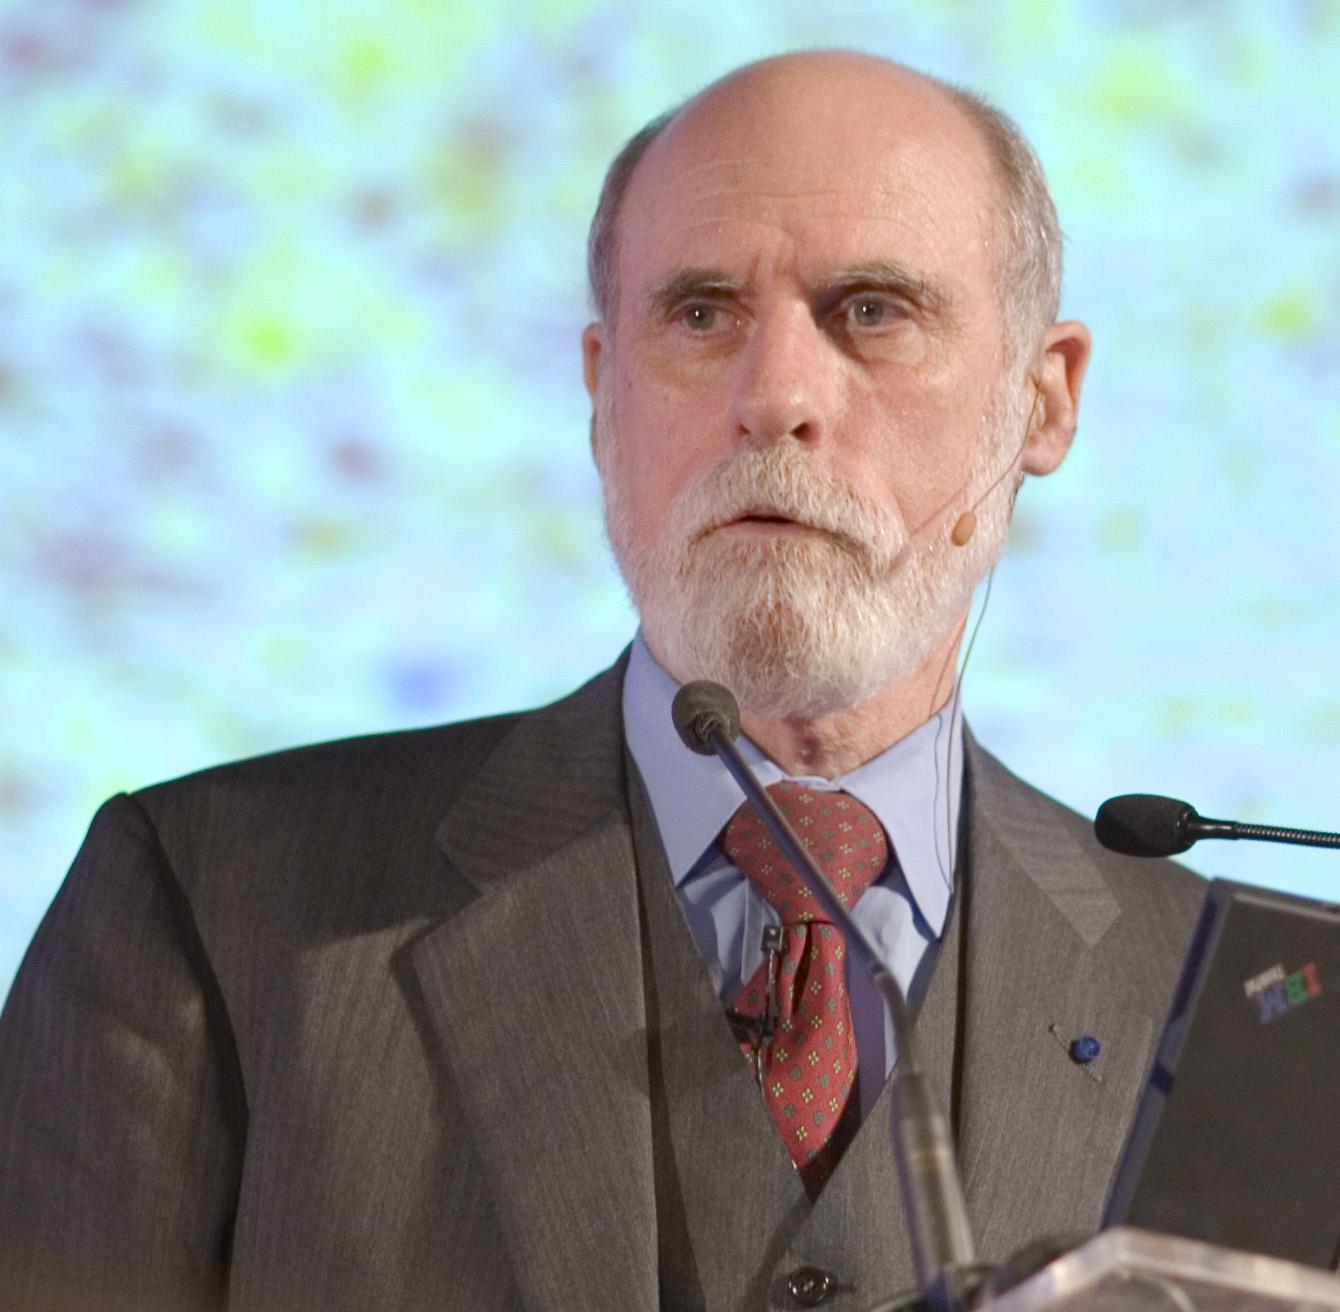 Vint Cerf om det öppna Internet